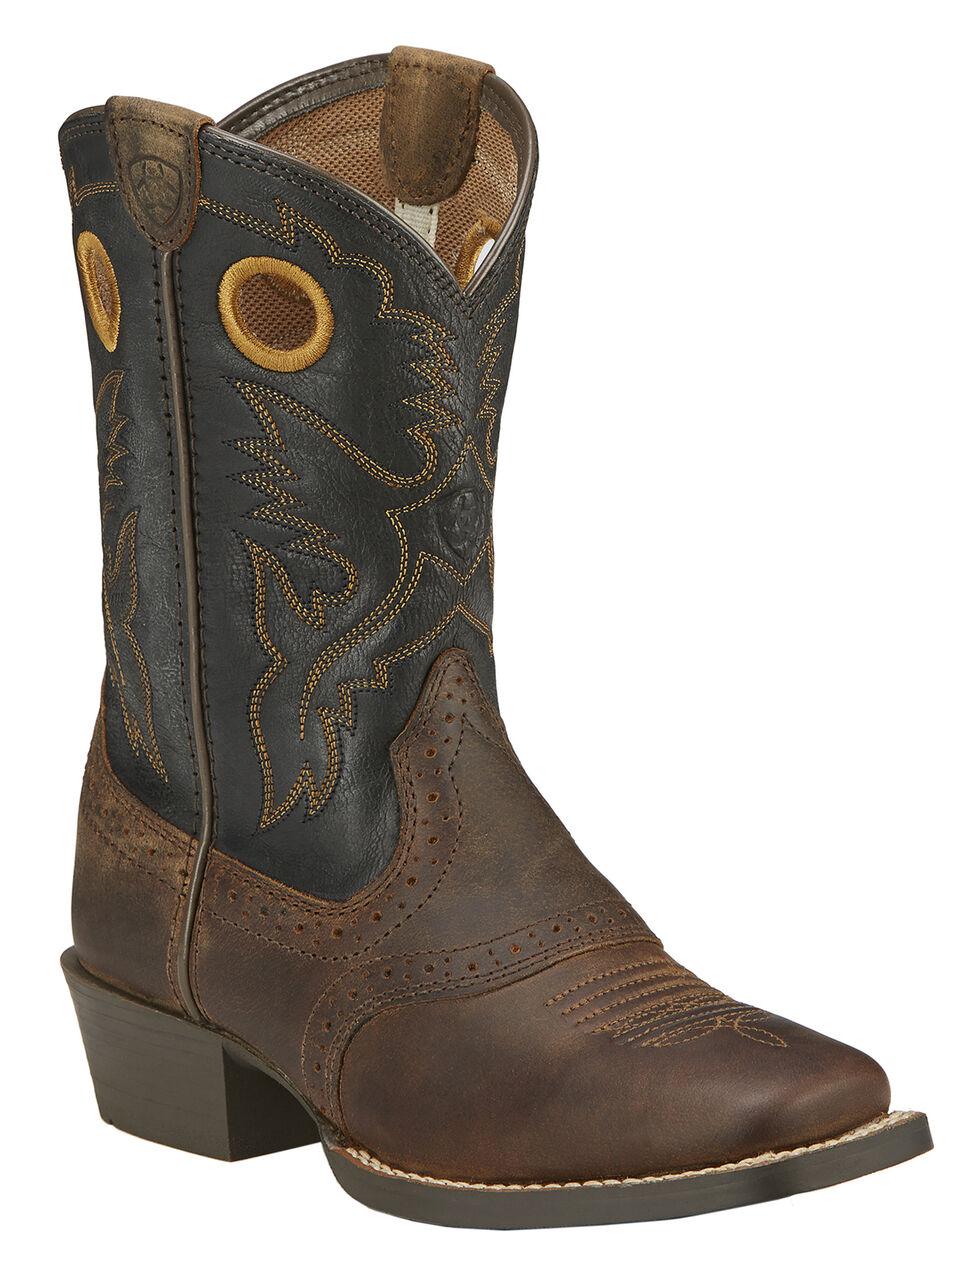 Ariat Boys' Roughstock Cowboy Boots - Square Toe, Brown, hi-res